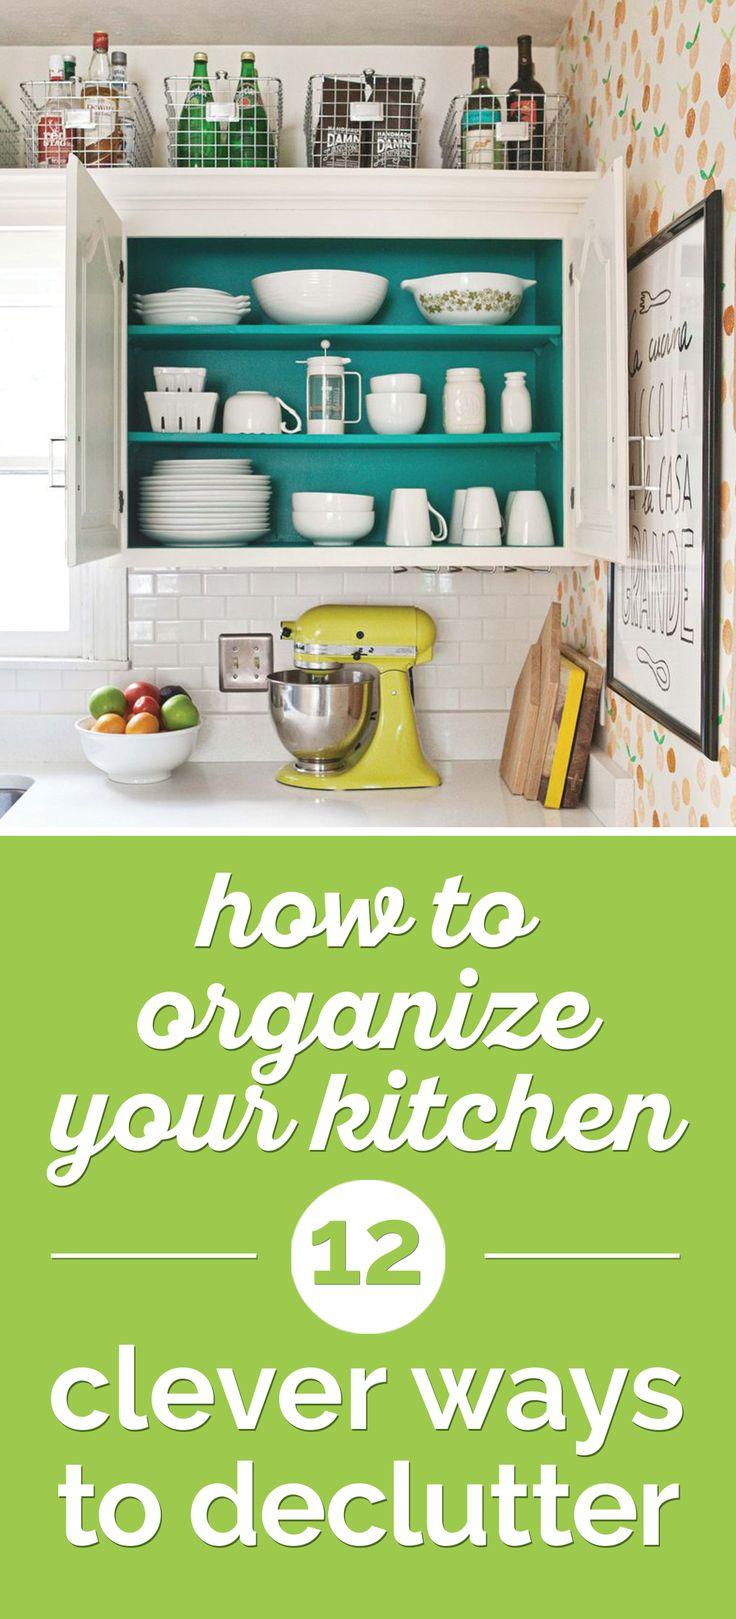 85 best images about Organization Ideas on Pinterest   Large cork ...